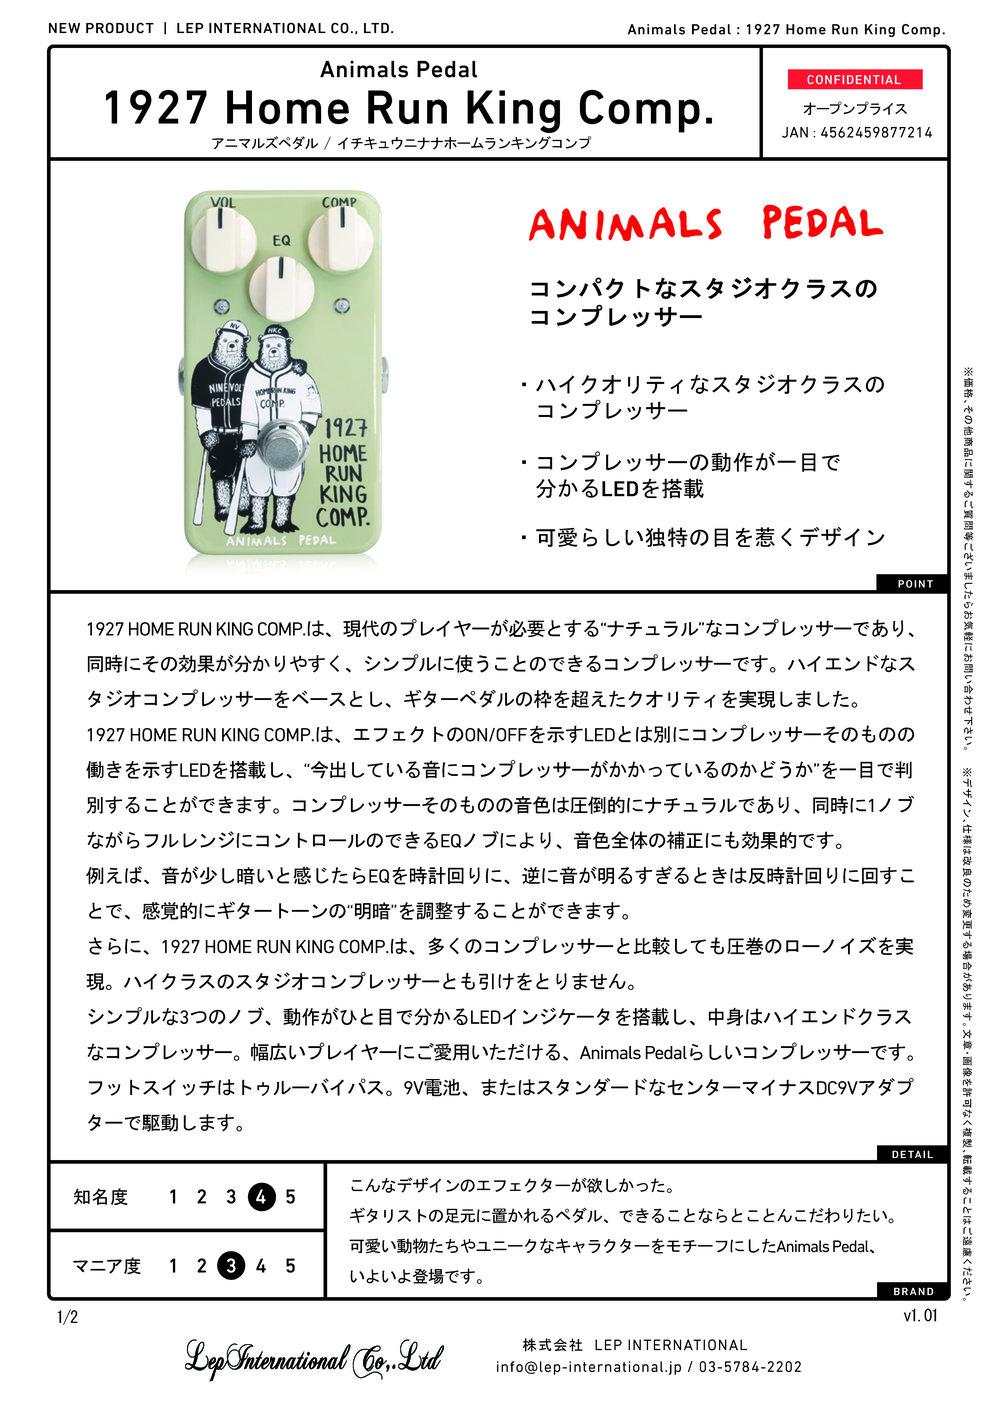 animalspedal 1927homerunkingcomp. v1.01 変更分_ページ_1.jpg